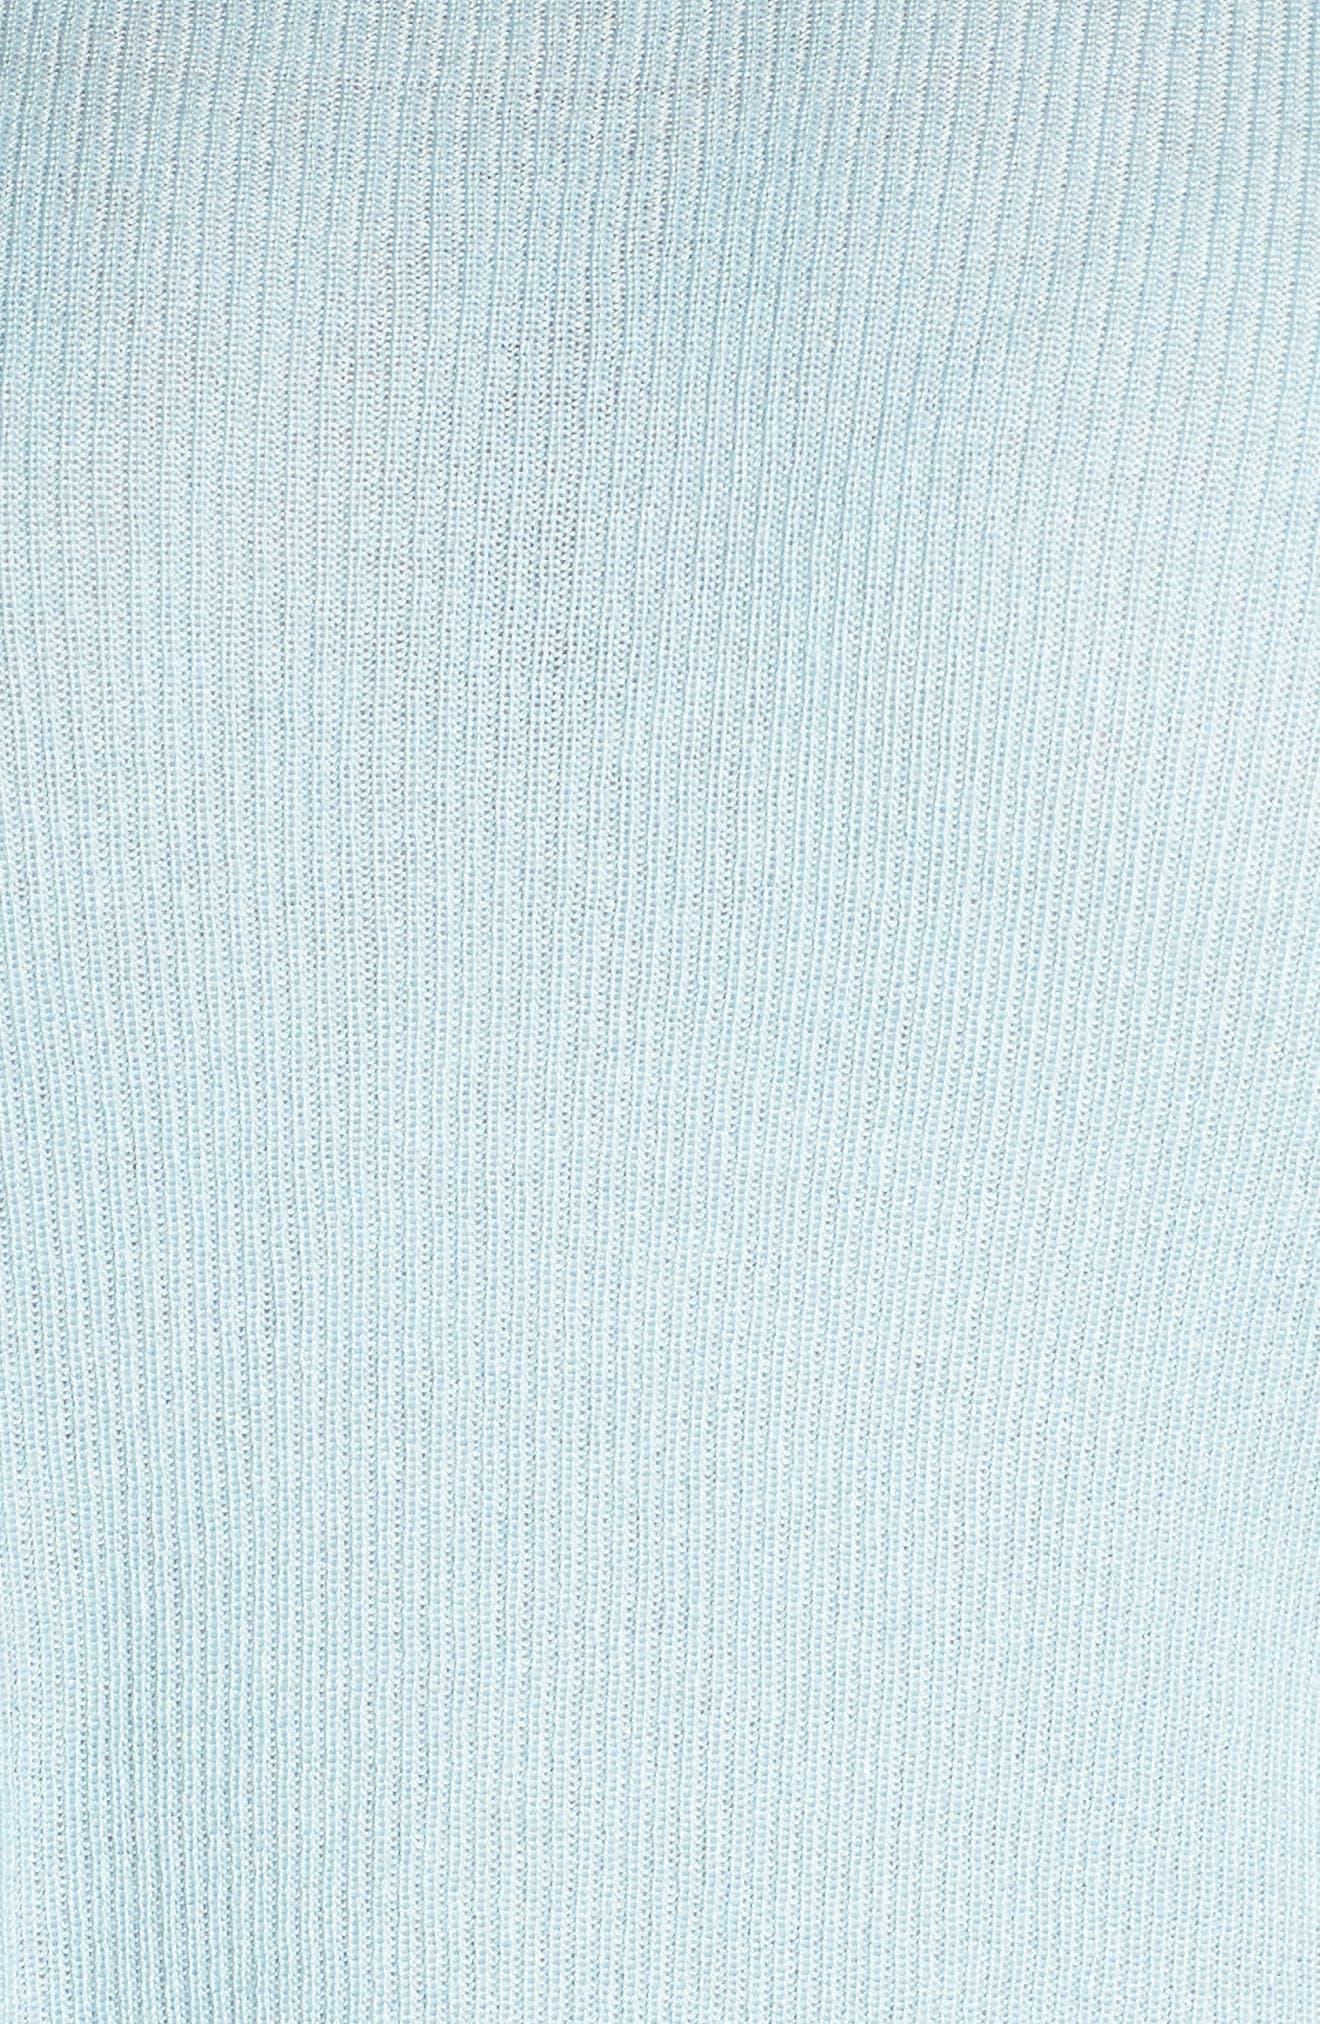 Drop Shoulder Ribbed Sweater,                             Alternate thumbnail 6, color,                             BLUE STERLING